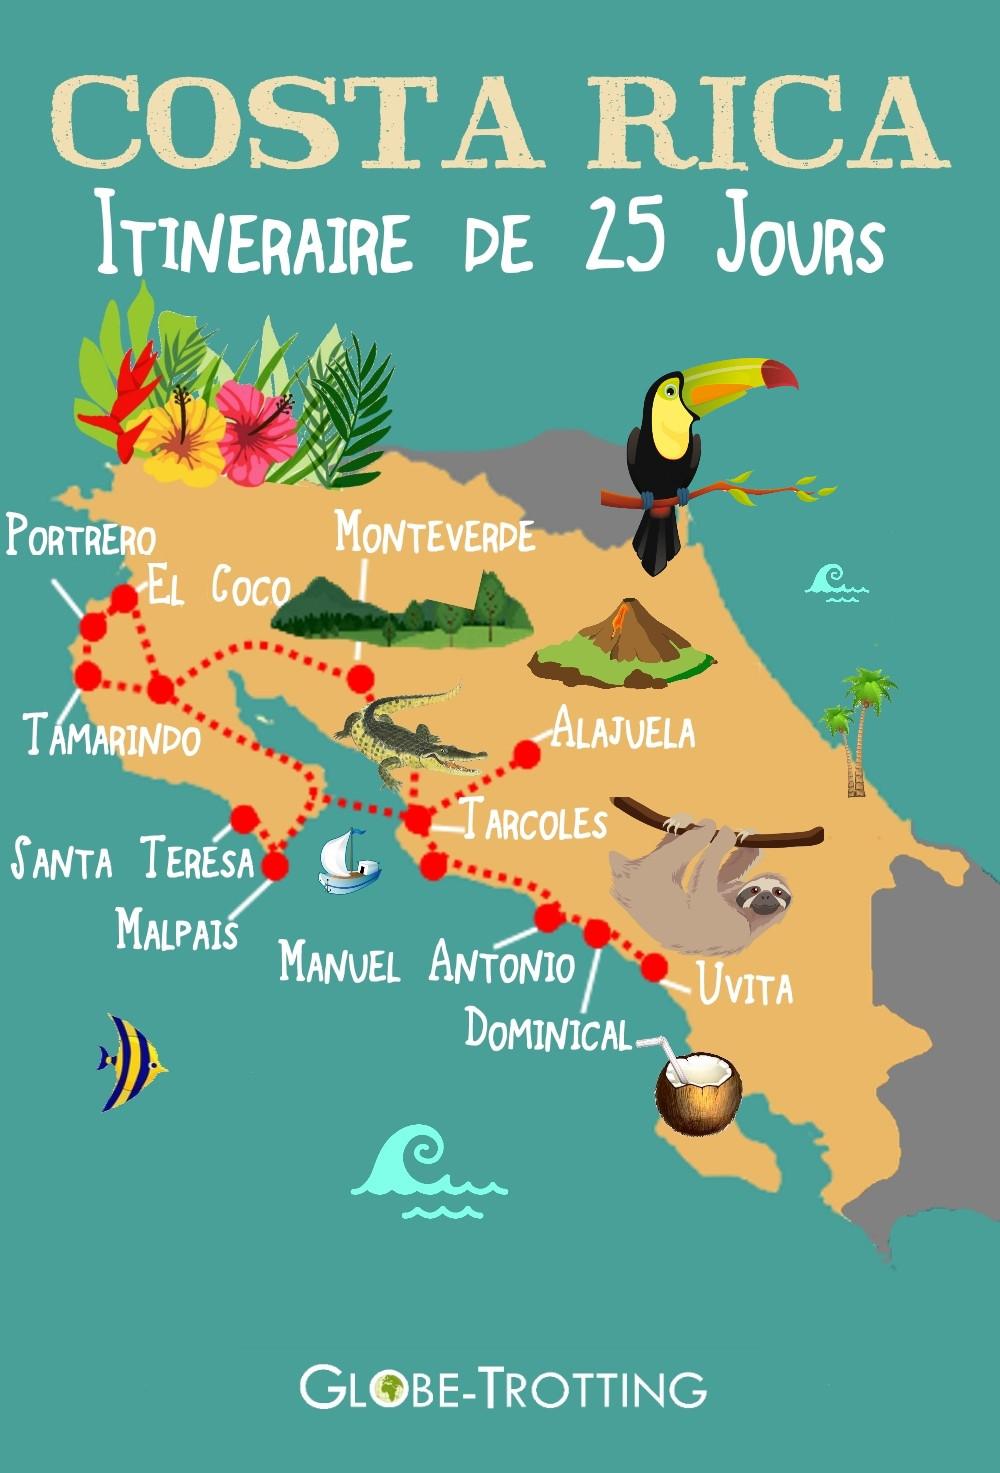 costa rica voyage en famille par Dominical